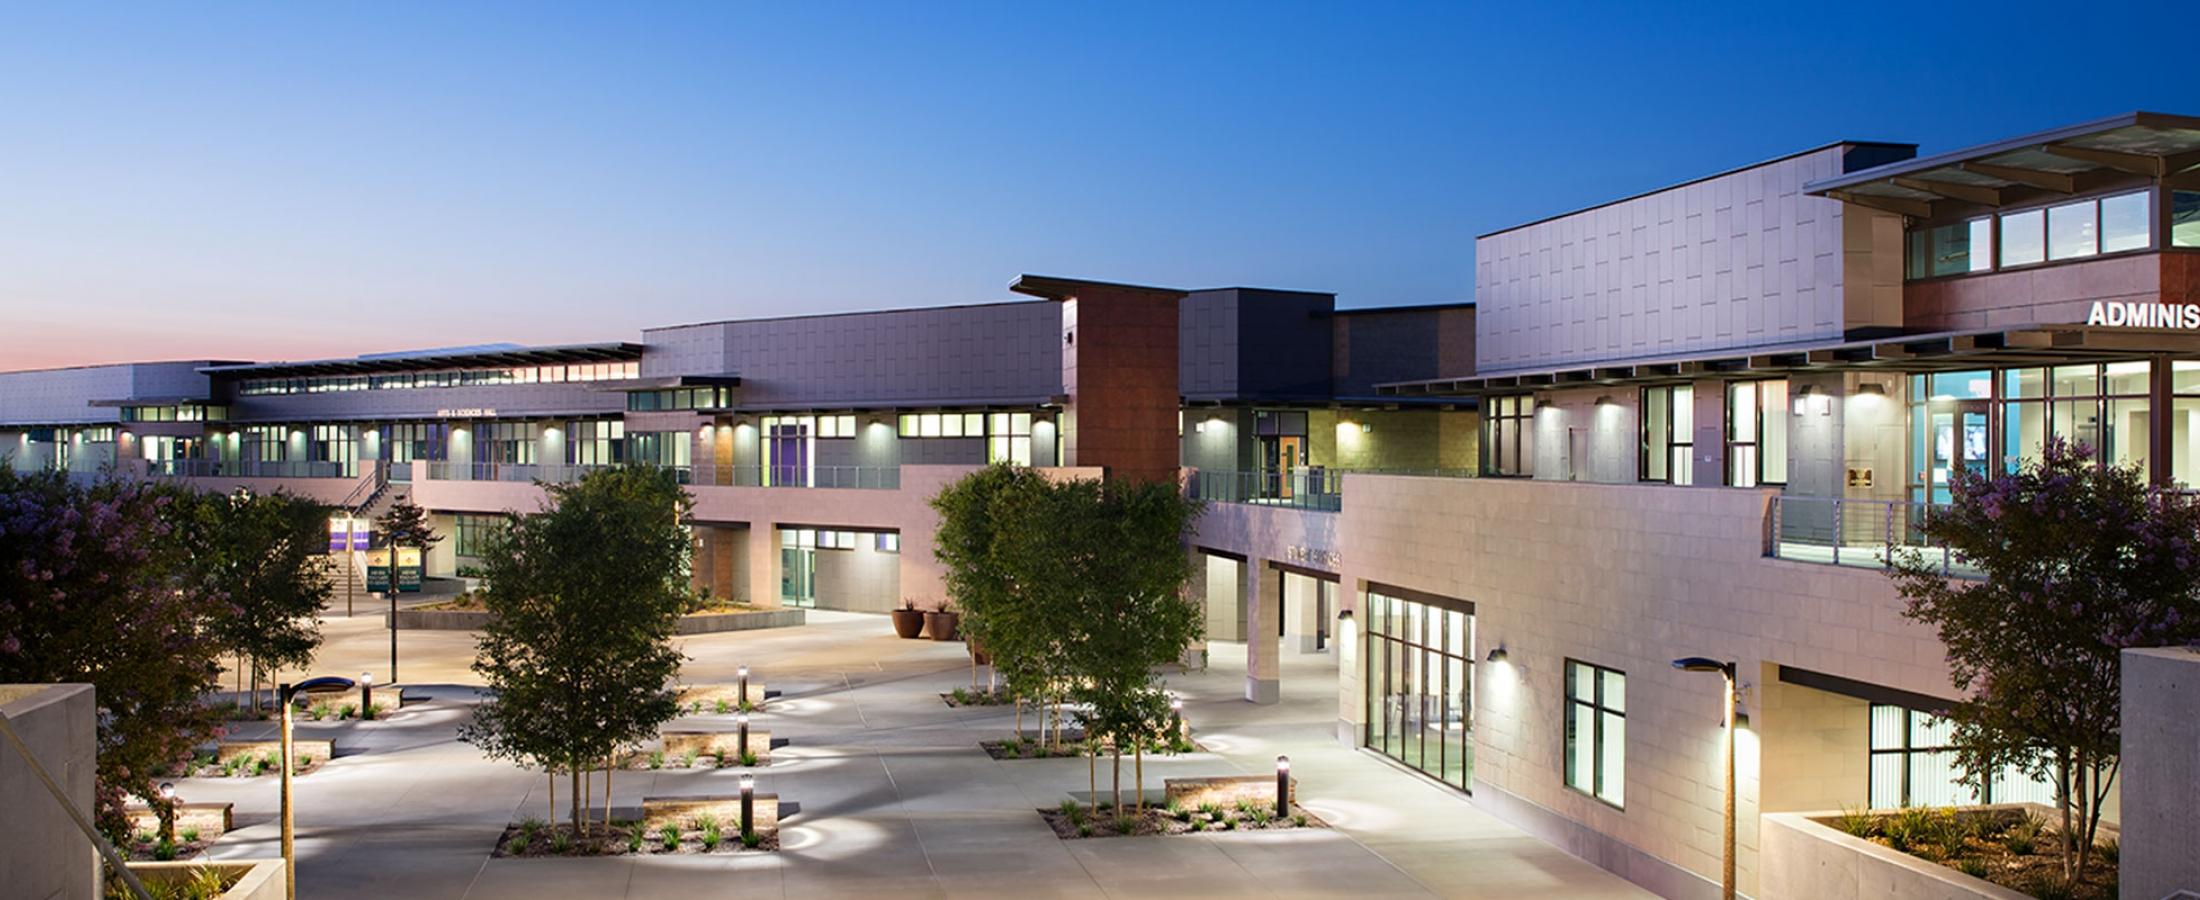 Cladding Corp Ceramic5 Del Lago Academy Rainscreen Installation